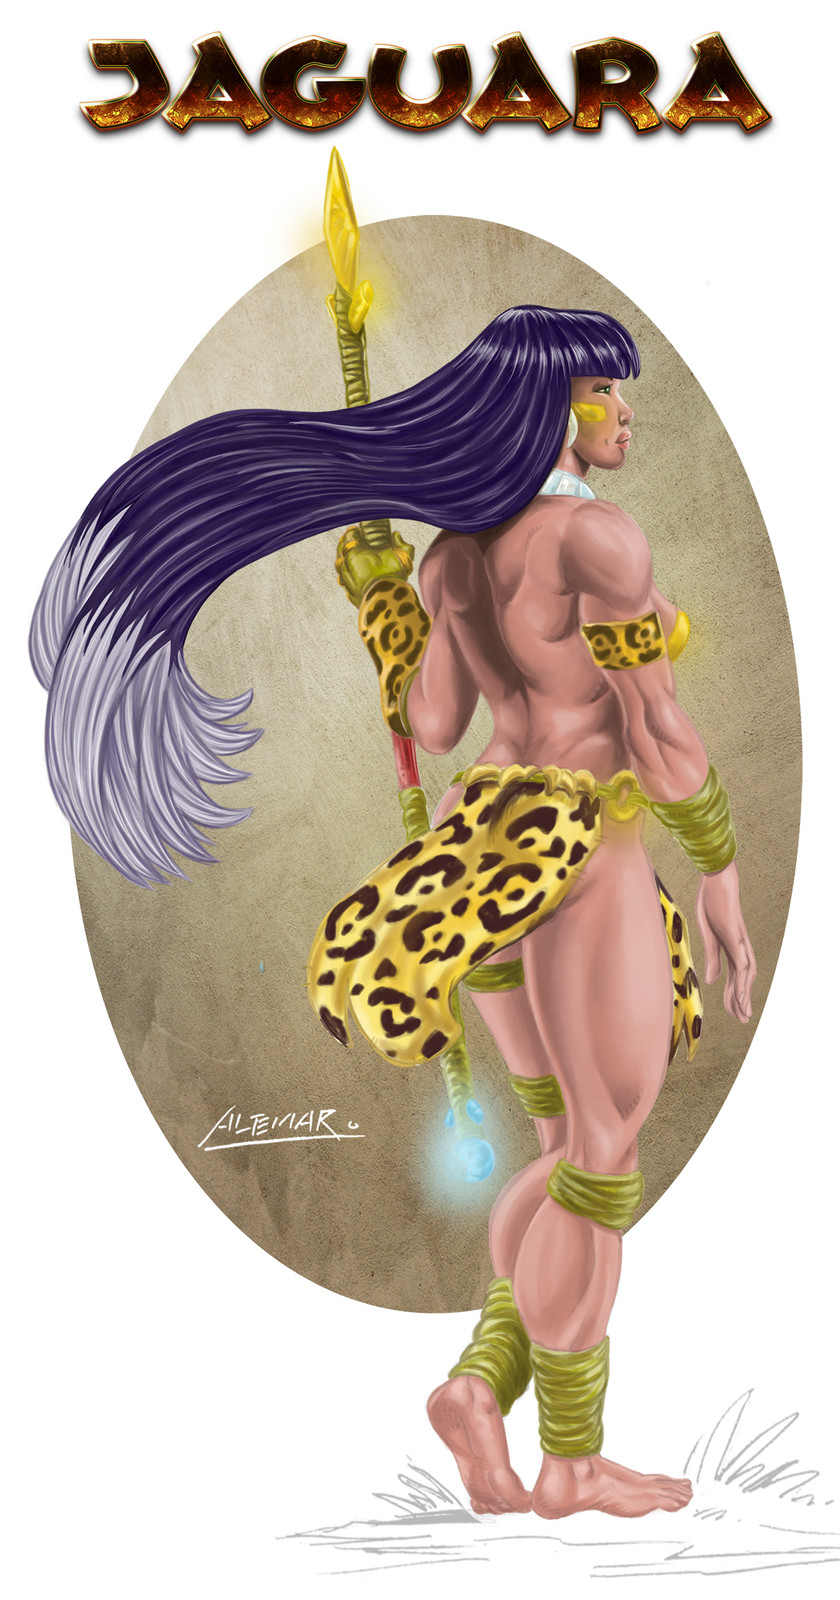 Jaguara - The great warrior